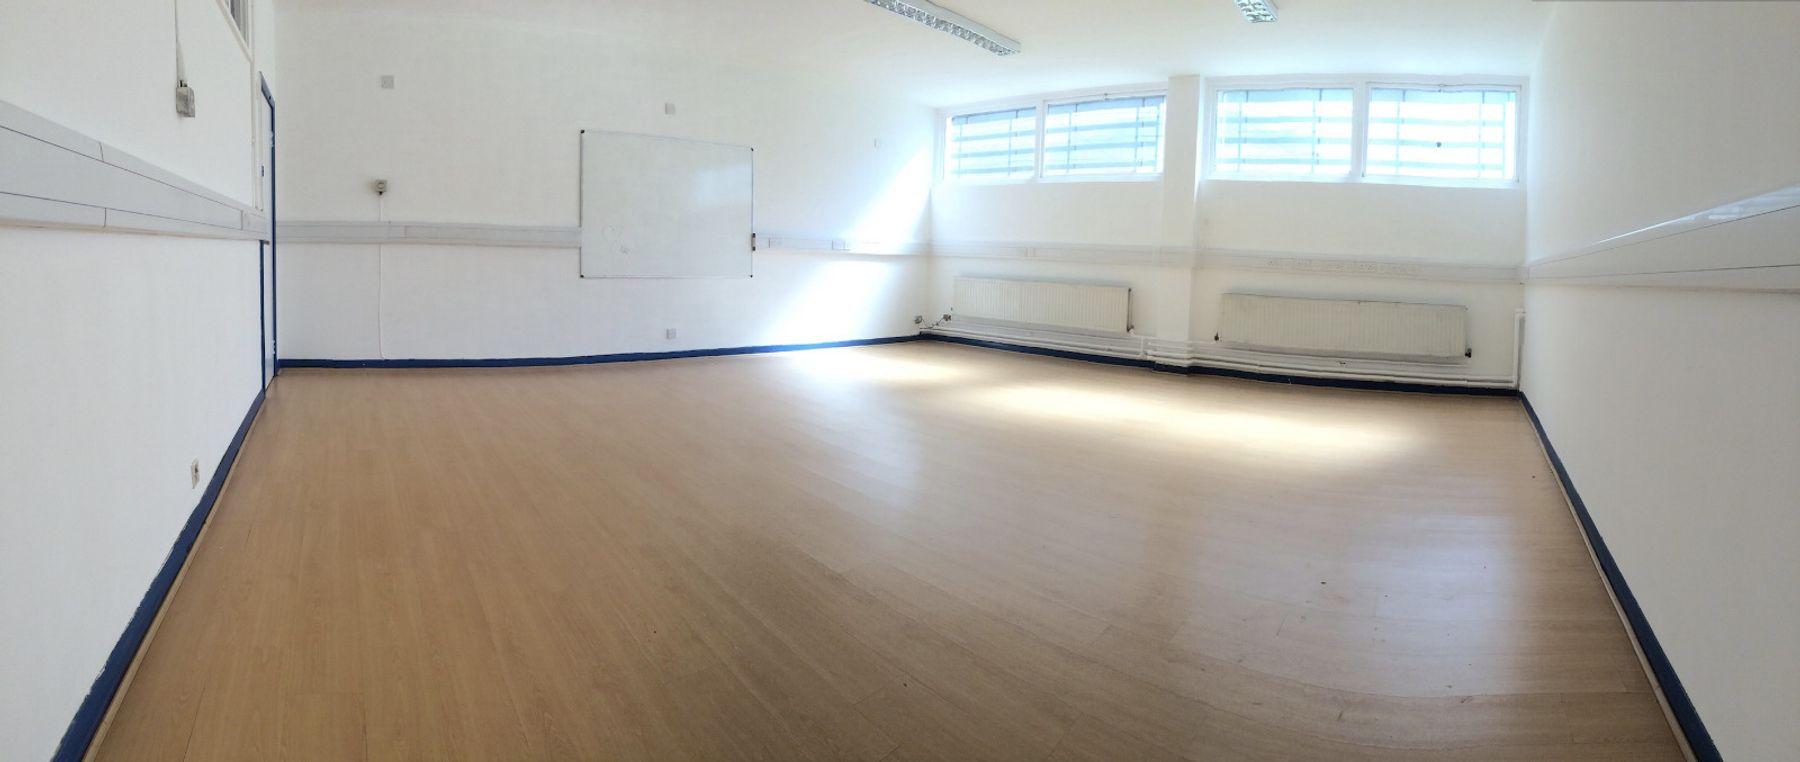 Rehearsal Studio 1